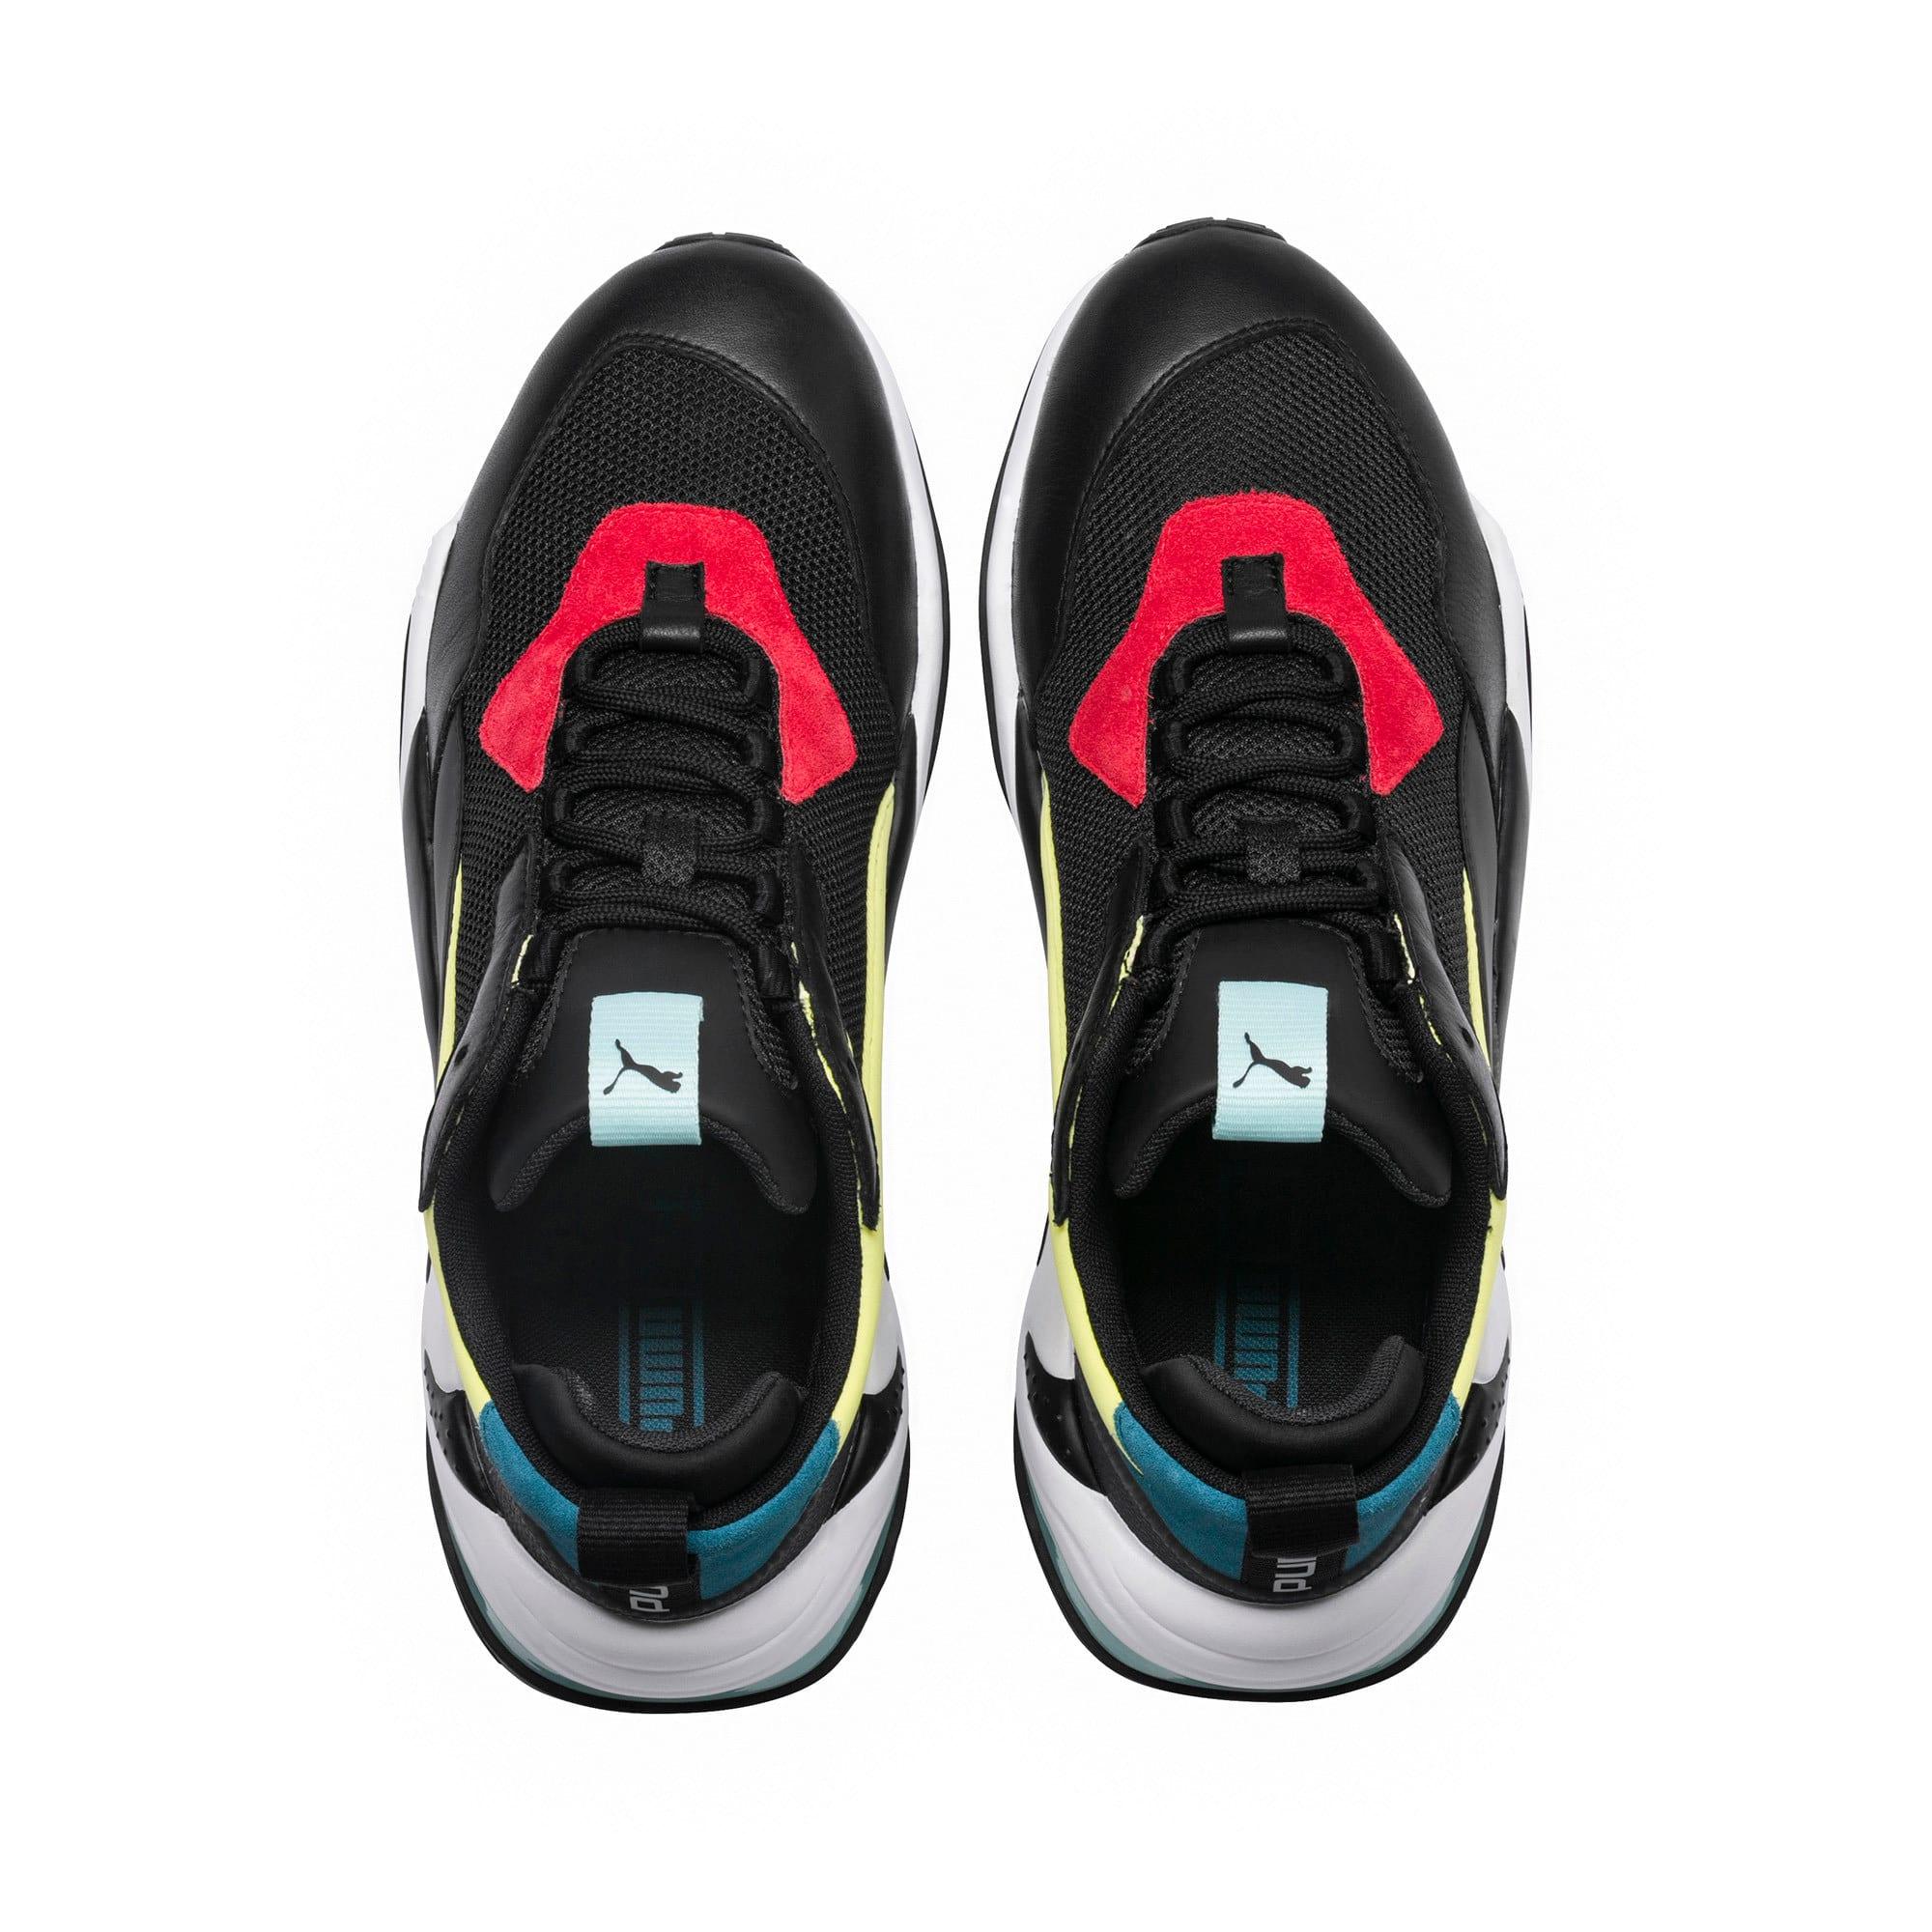 Thumbnail 6 of Thunder Spectra Sneakers, Puma Blk-Puma Blk-Puma White, medium